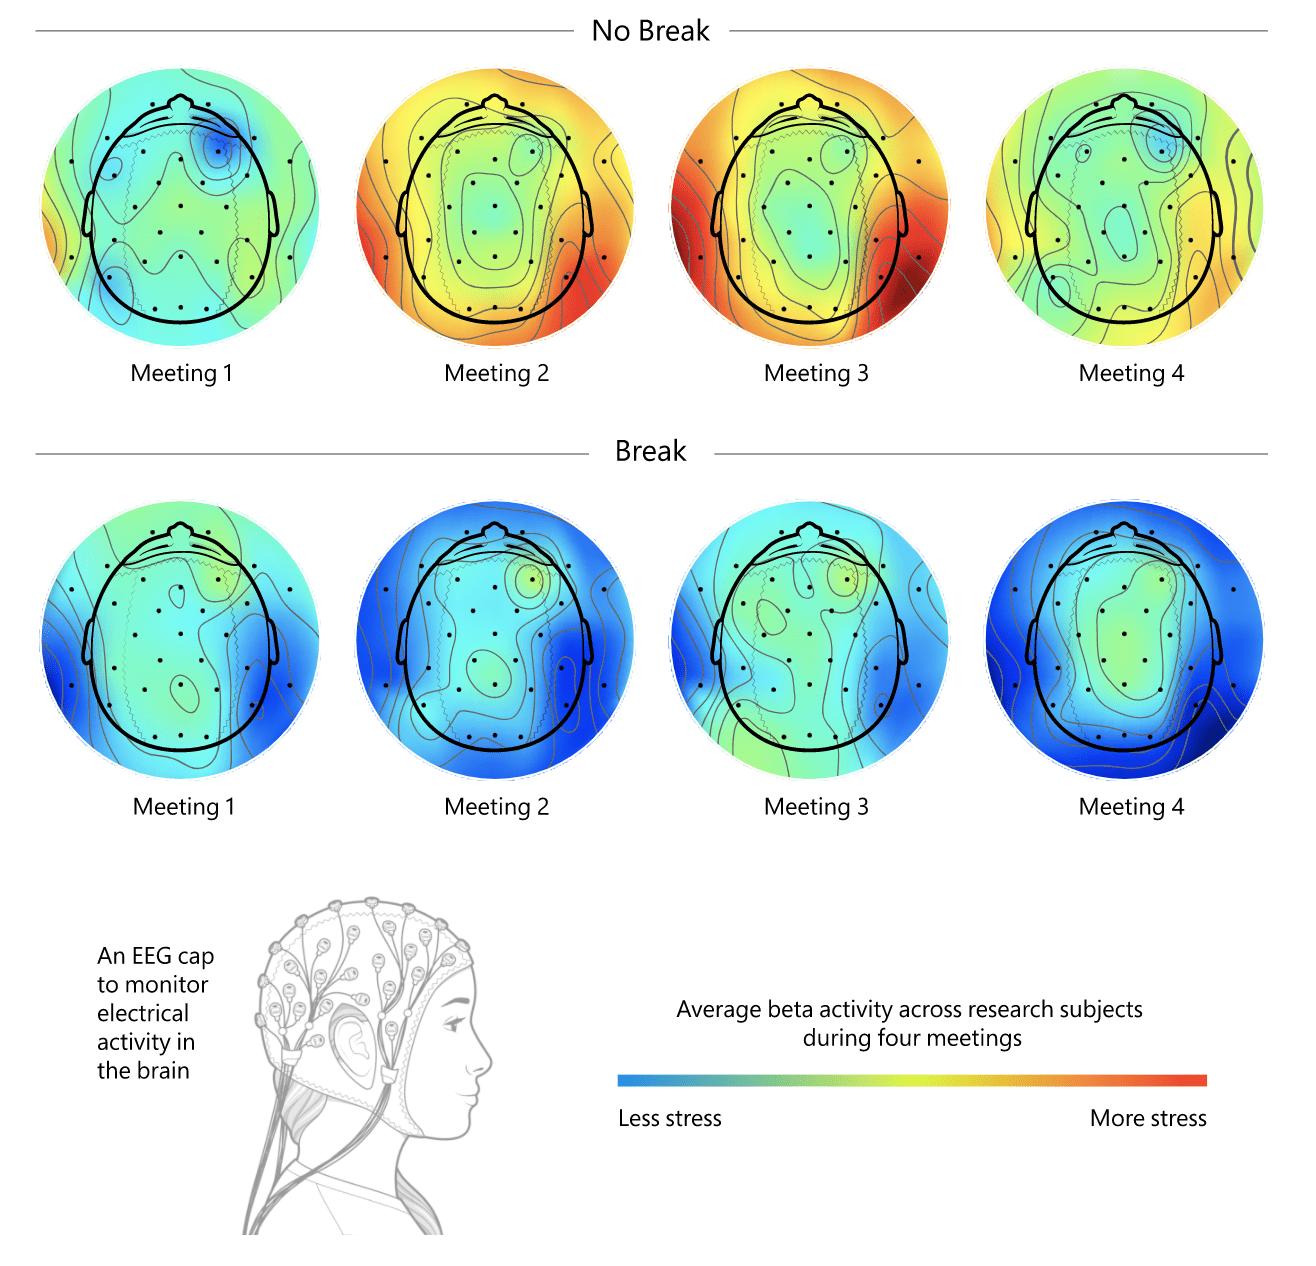 Your brain needs a break during virtual meetings in remote work